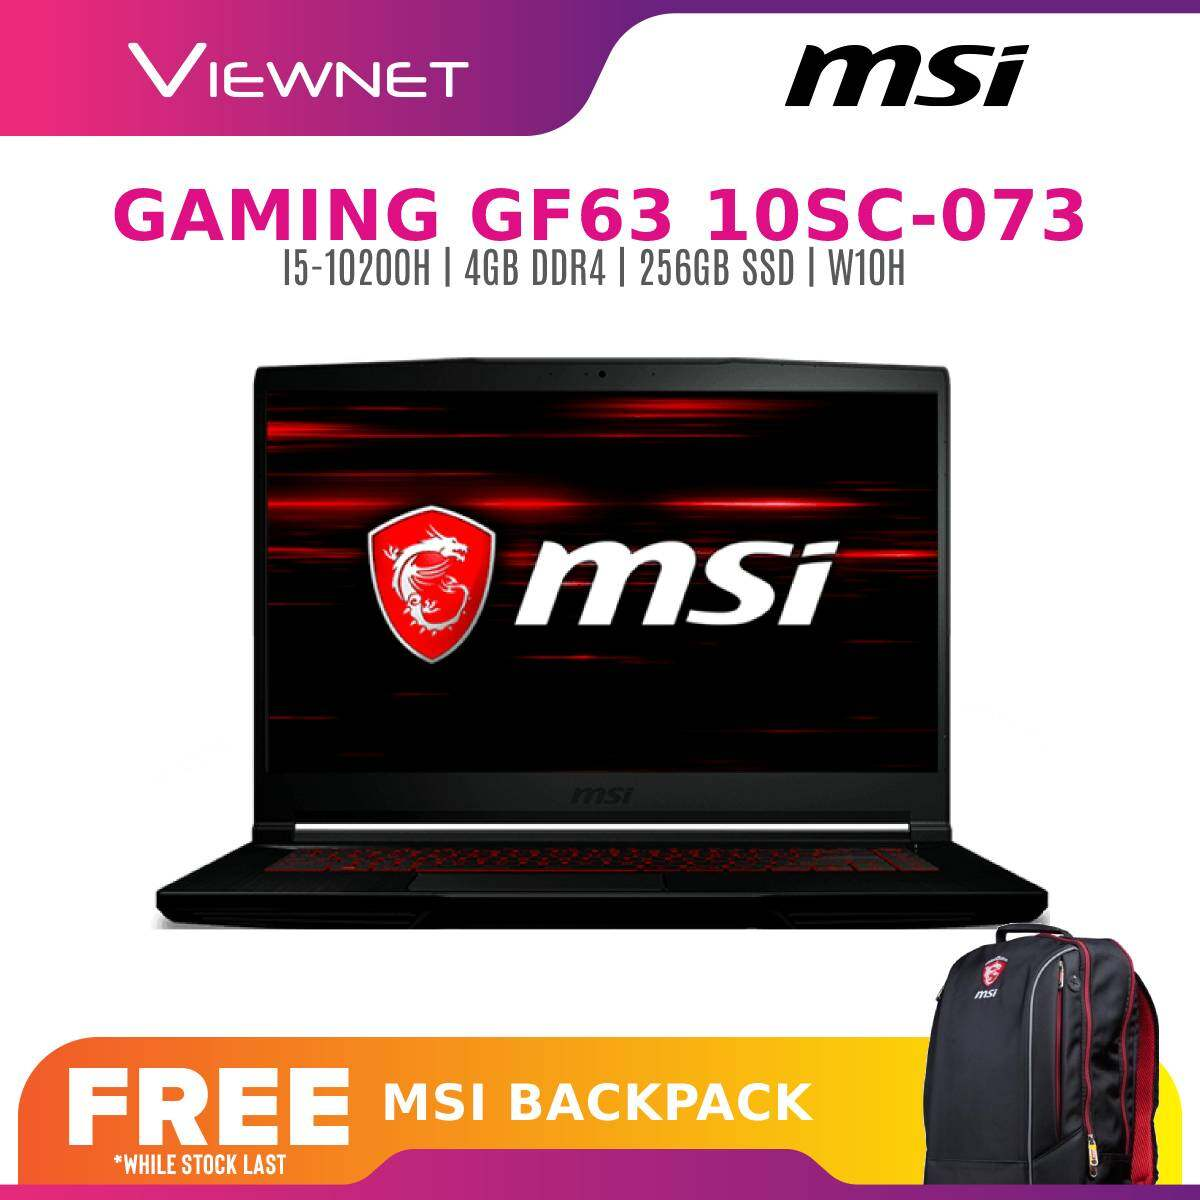 MSI GAMING LAPTOP GF63 10SC-073MY (INTEL CORE I5-10200H PROCESSOR/ NVIDIA GEFORCE GTX 1650 MAX-Q, 4GB GDDR6)